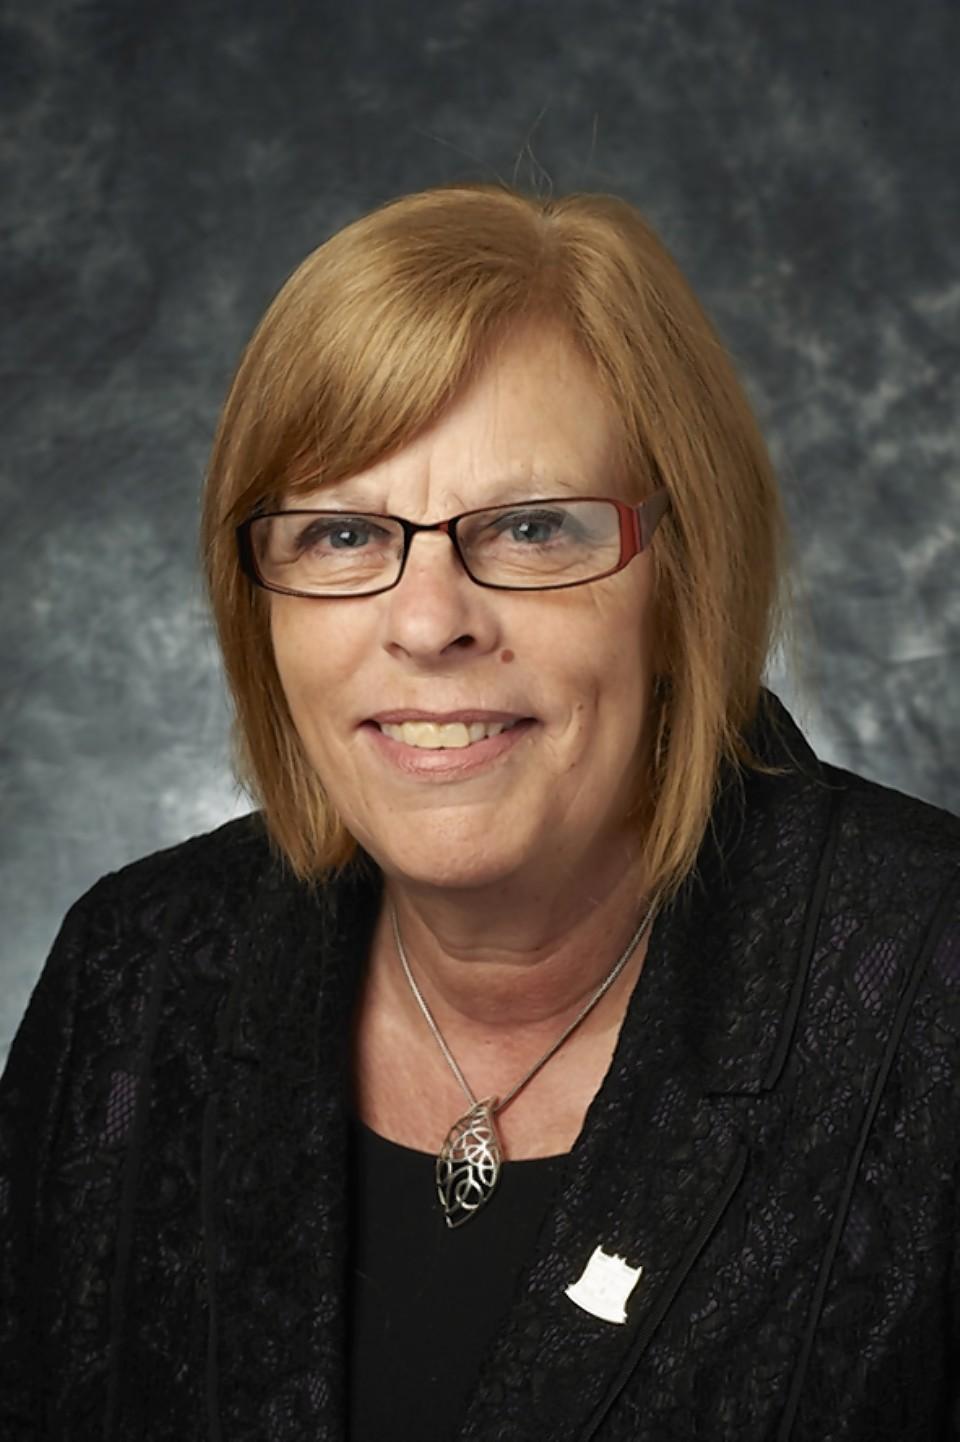 Depute Provost of Inverness Bet McAllister